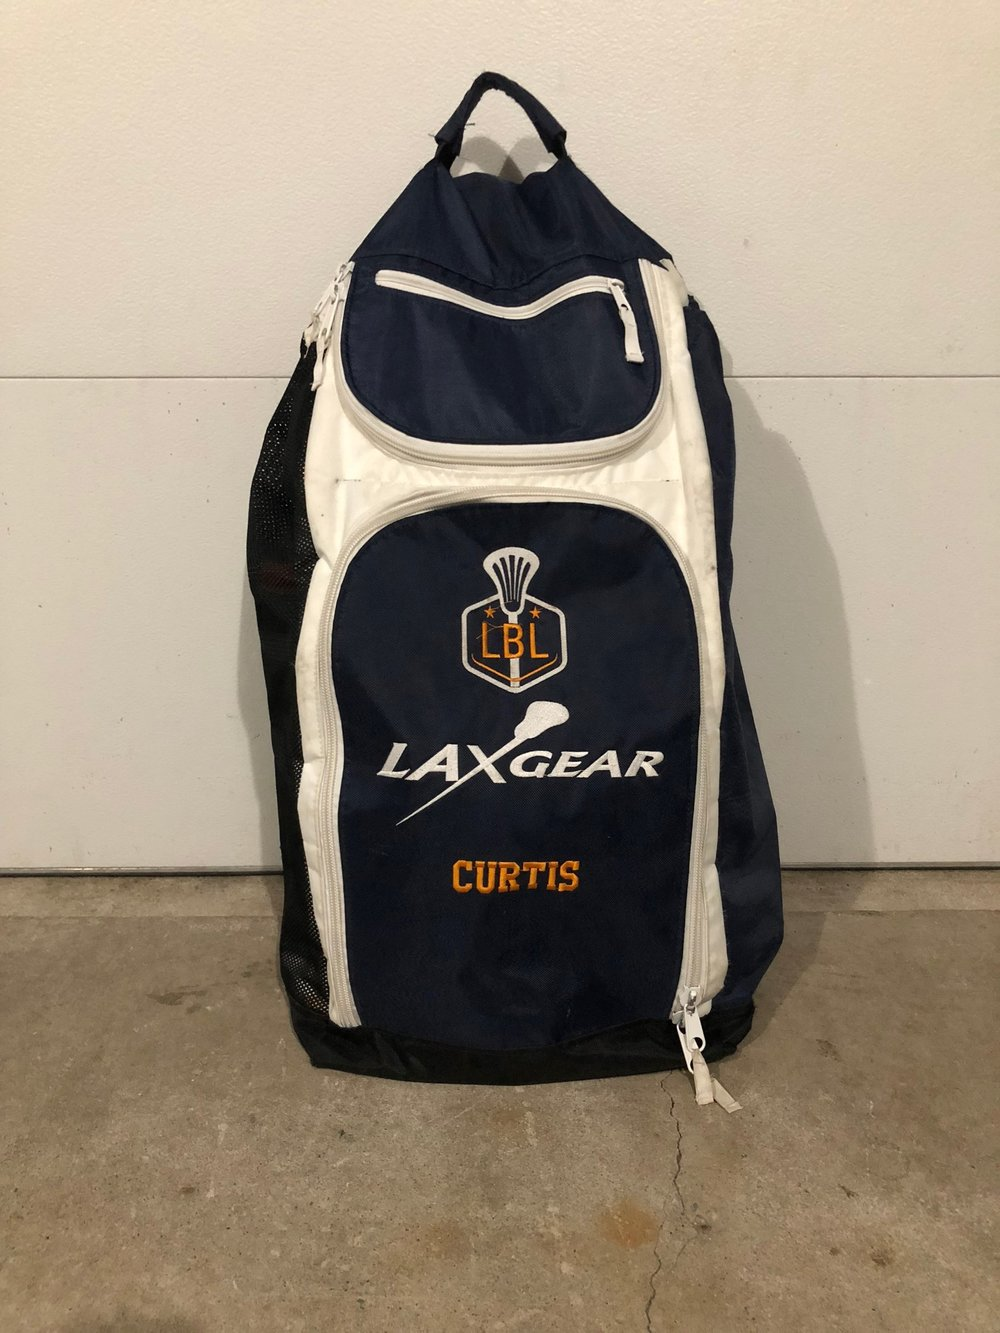 LBL_Lower_Bucks_Lacrosse_bag_pic_1024x1024@2x.jpg